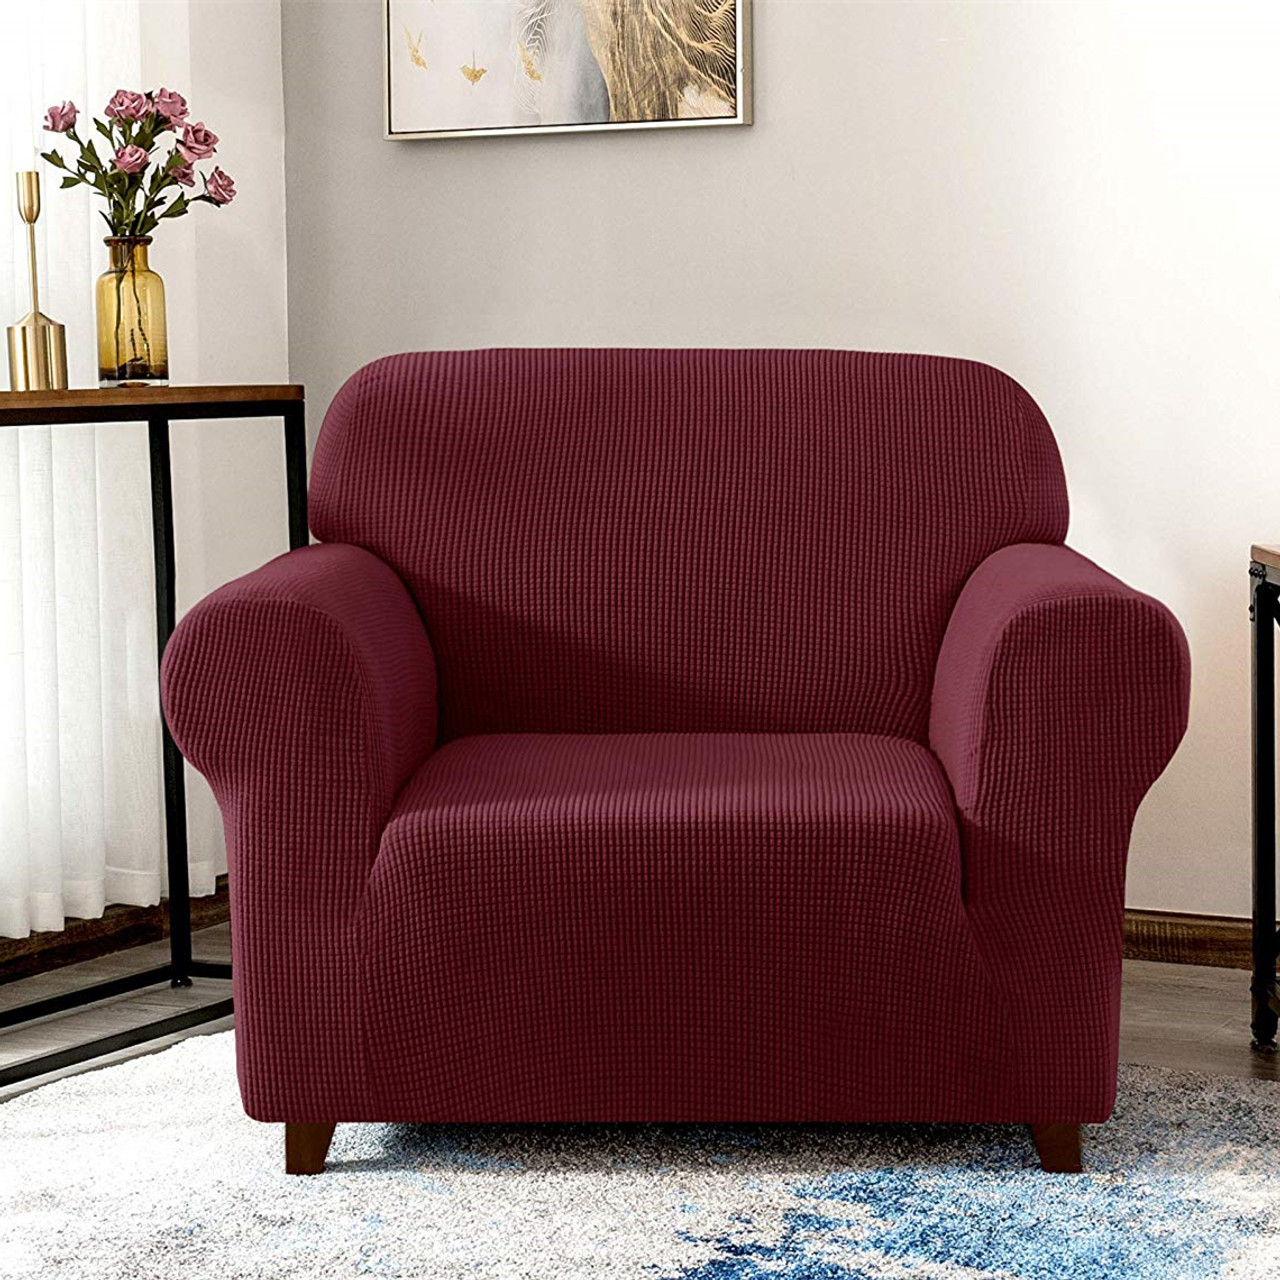 Wine Red Jacquard Polyester Spandex Fabric Box Cushion Armchair Slipcover Enova Home